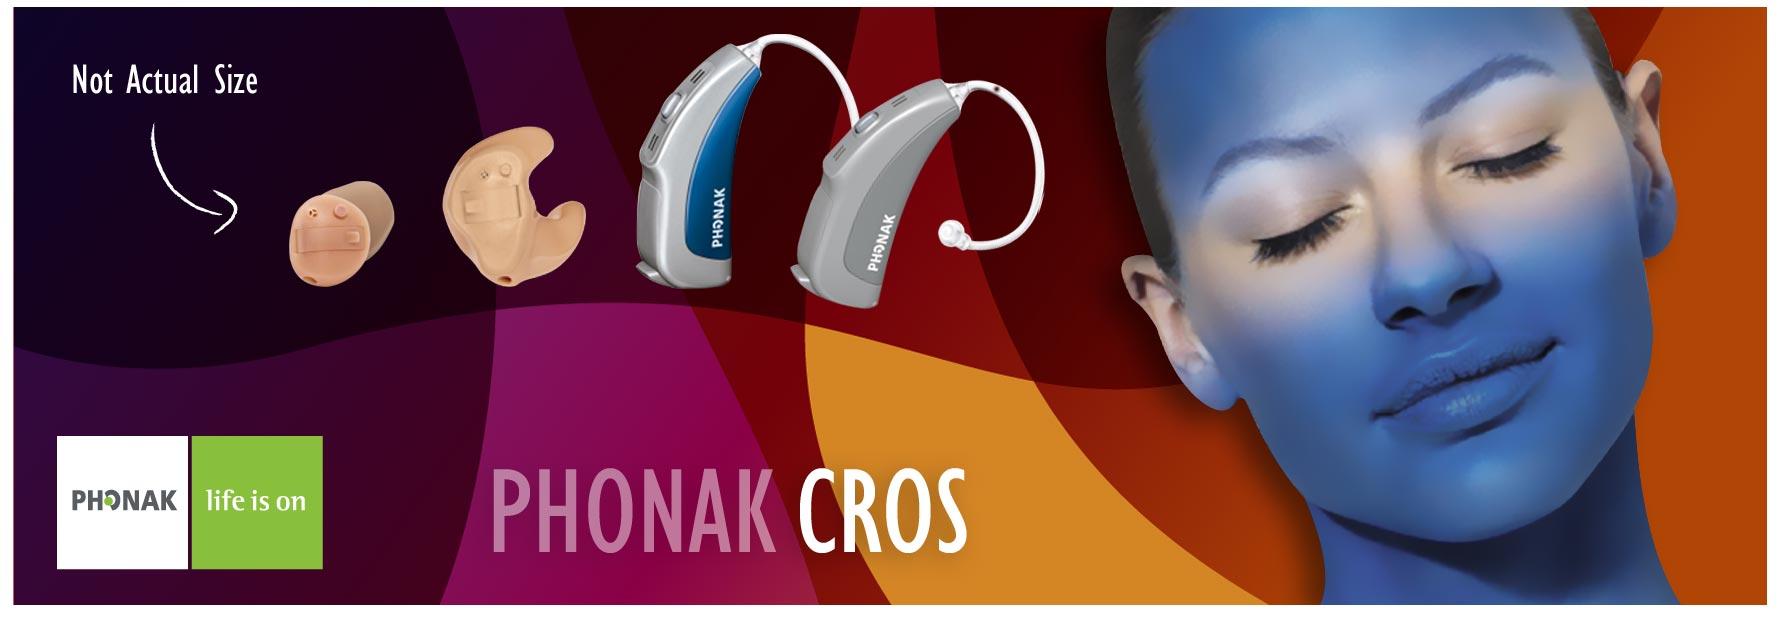 phonak cros hearing aids banner